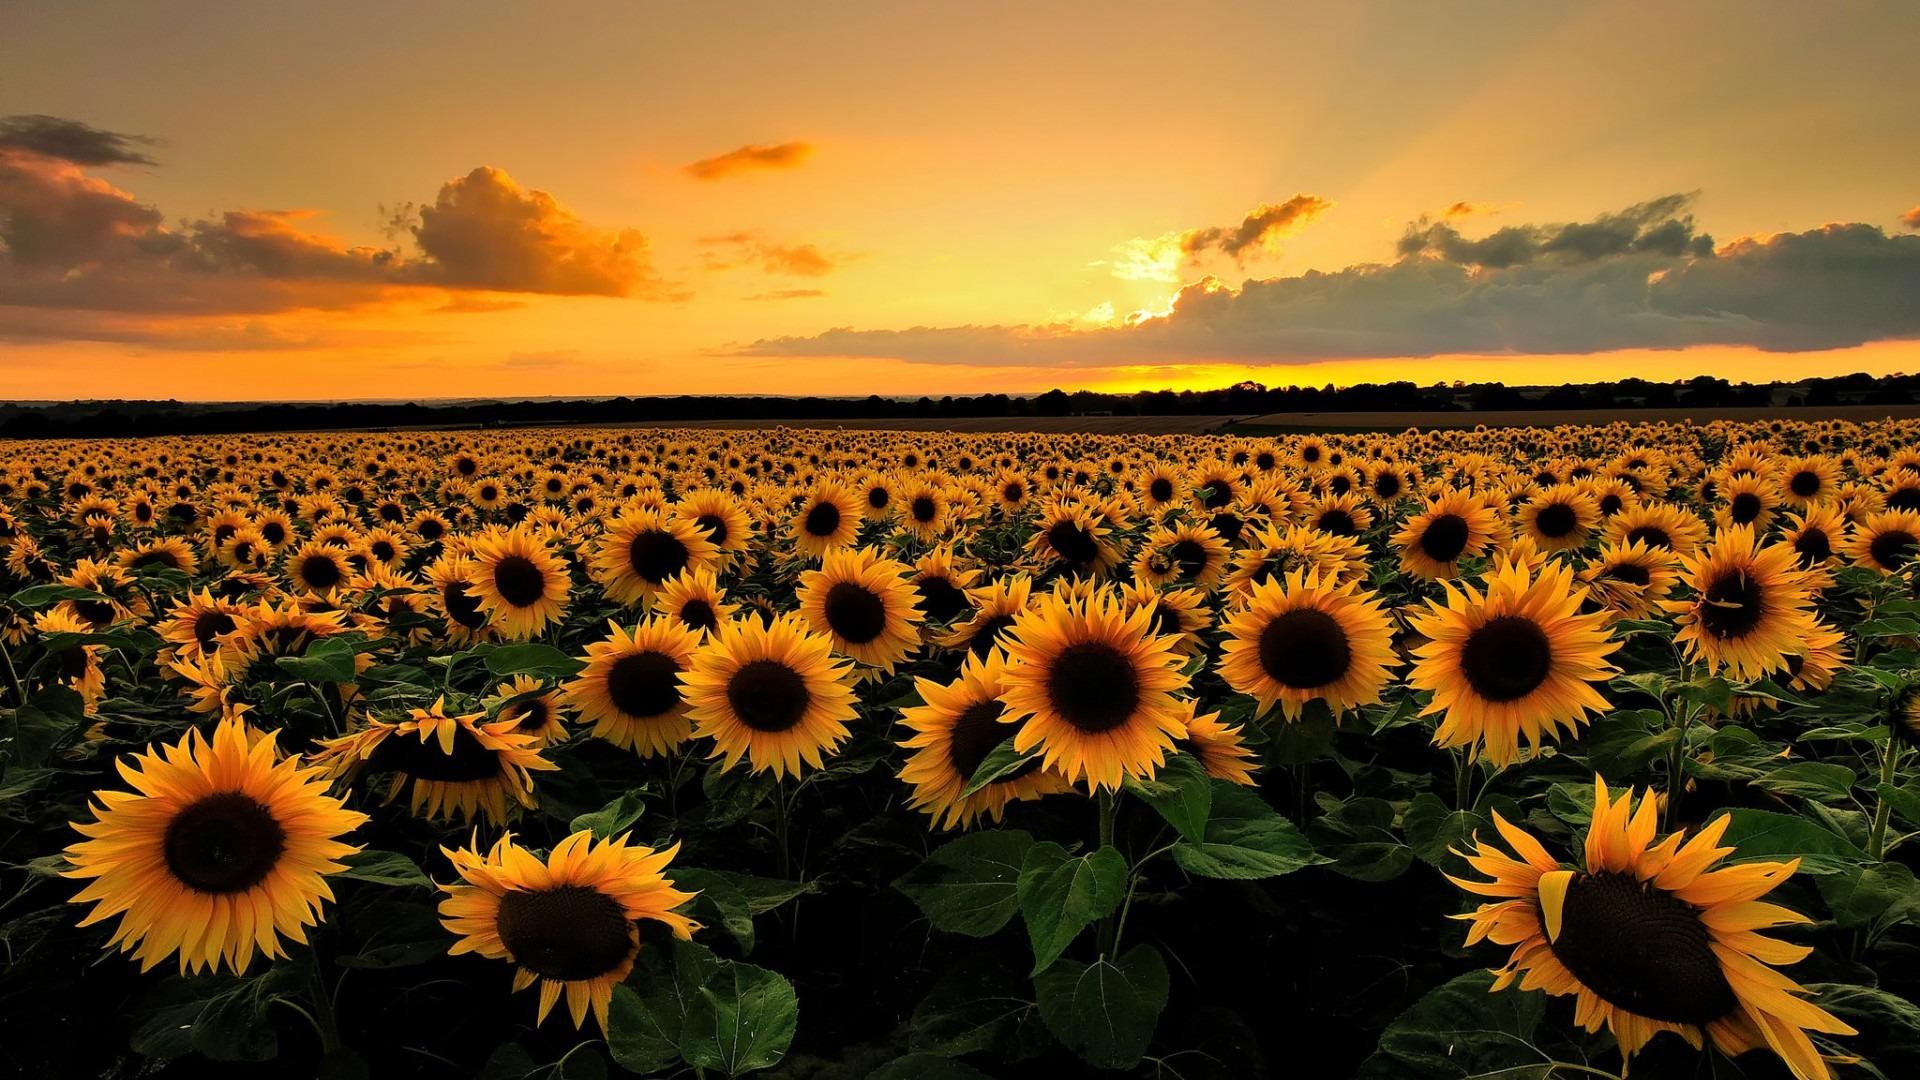 Beautiful Sunflower Field Wallpaper 32397